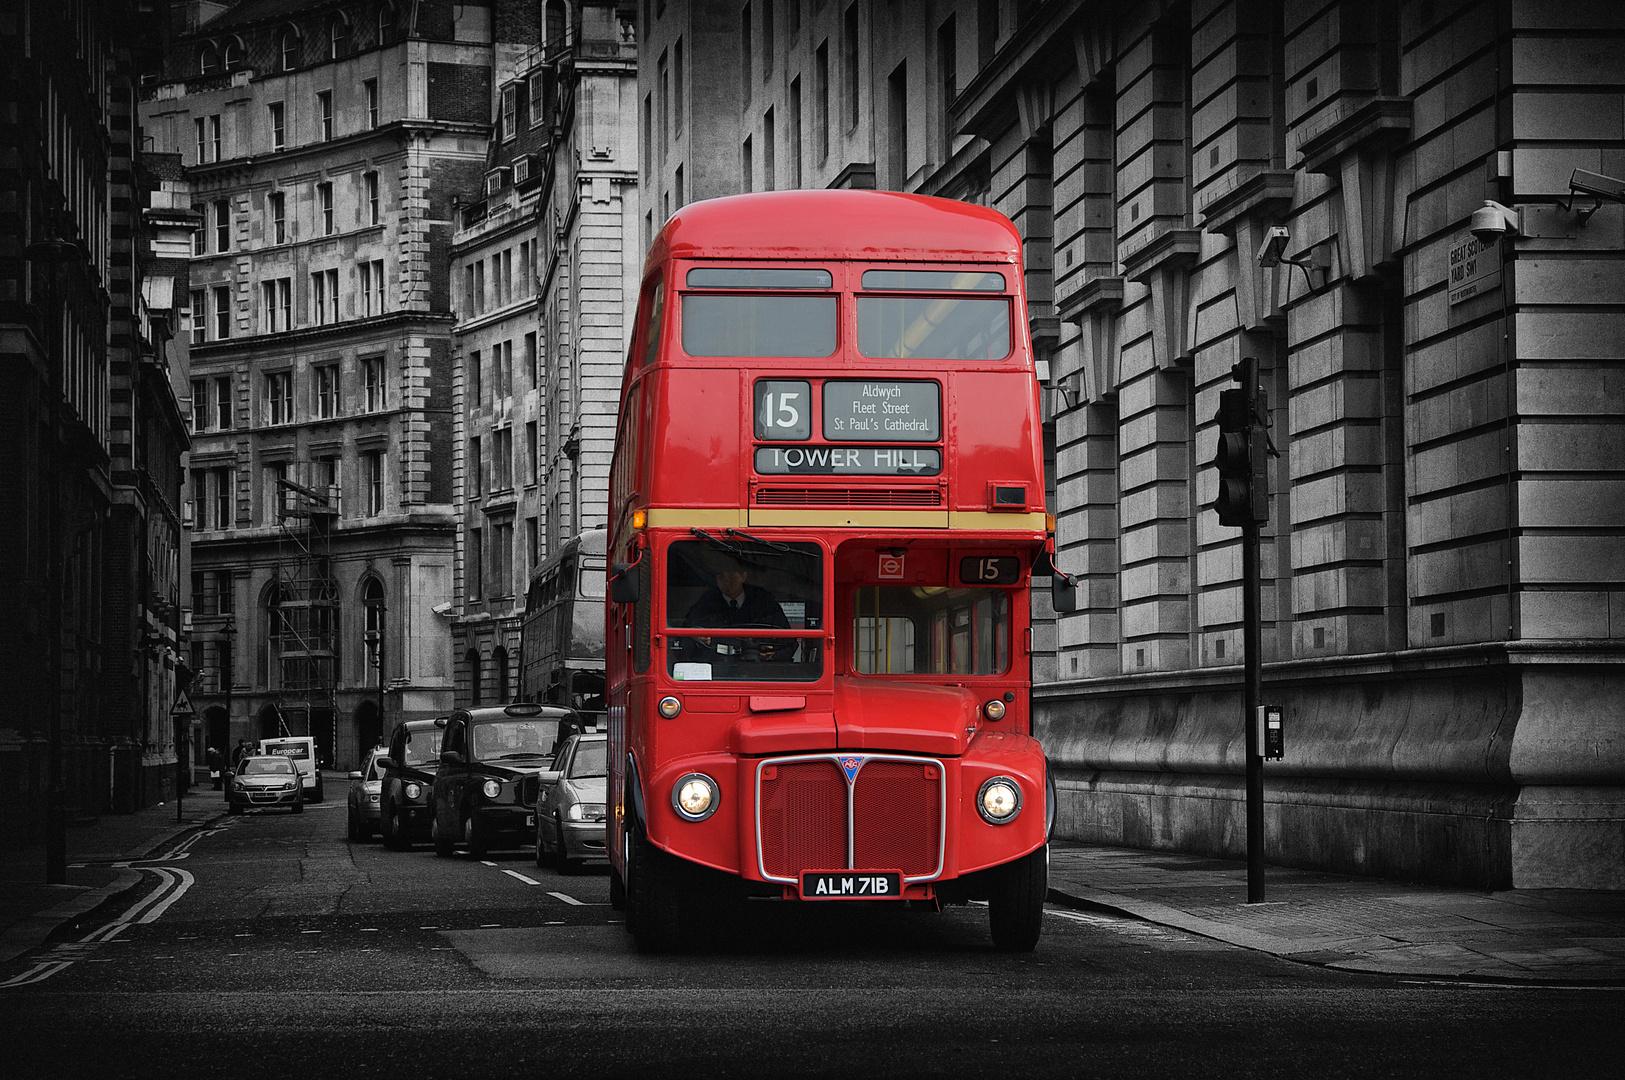 colorkey london bus foto bild city london world bilder auf fotocommunity. Black Bedroom Furniture Sets. Home Design Ideas